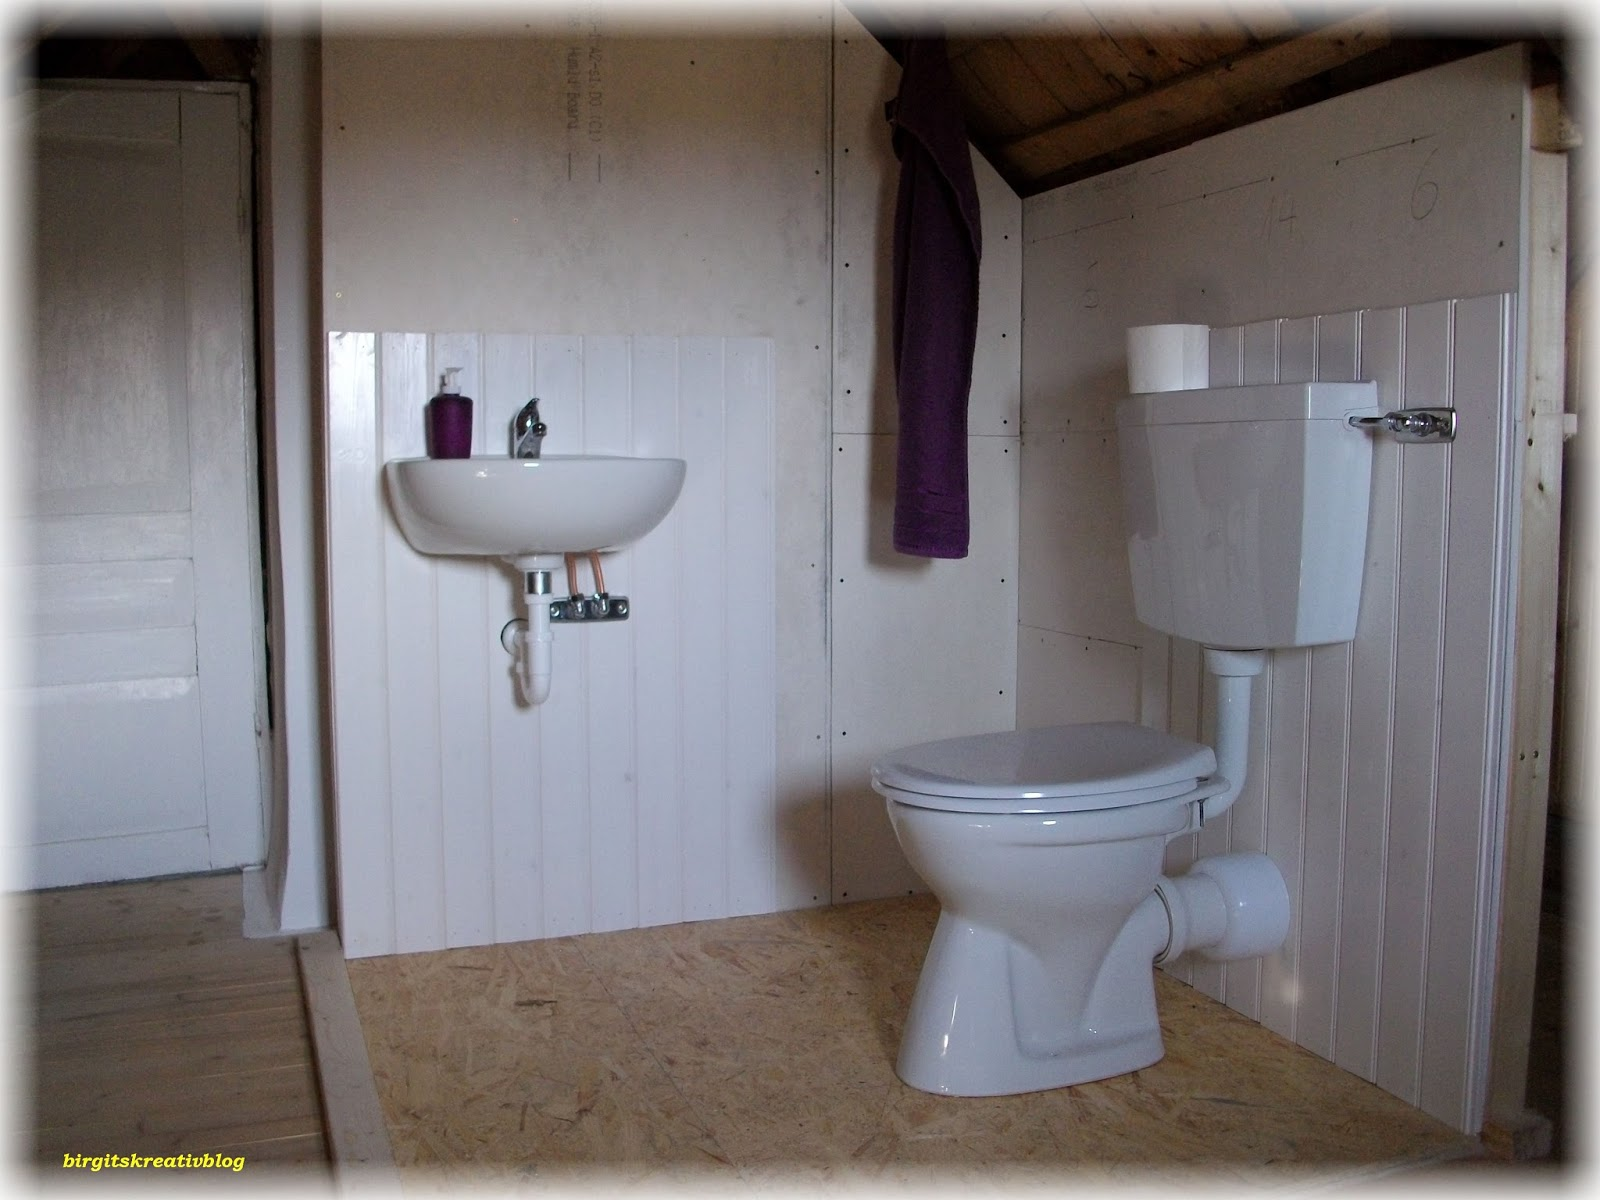 wc abflussrohr verlegen f r wand wc ostseesuche com. Black Bedroom Furniture Sets. Home Design Ideas